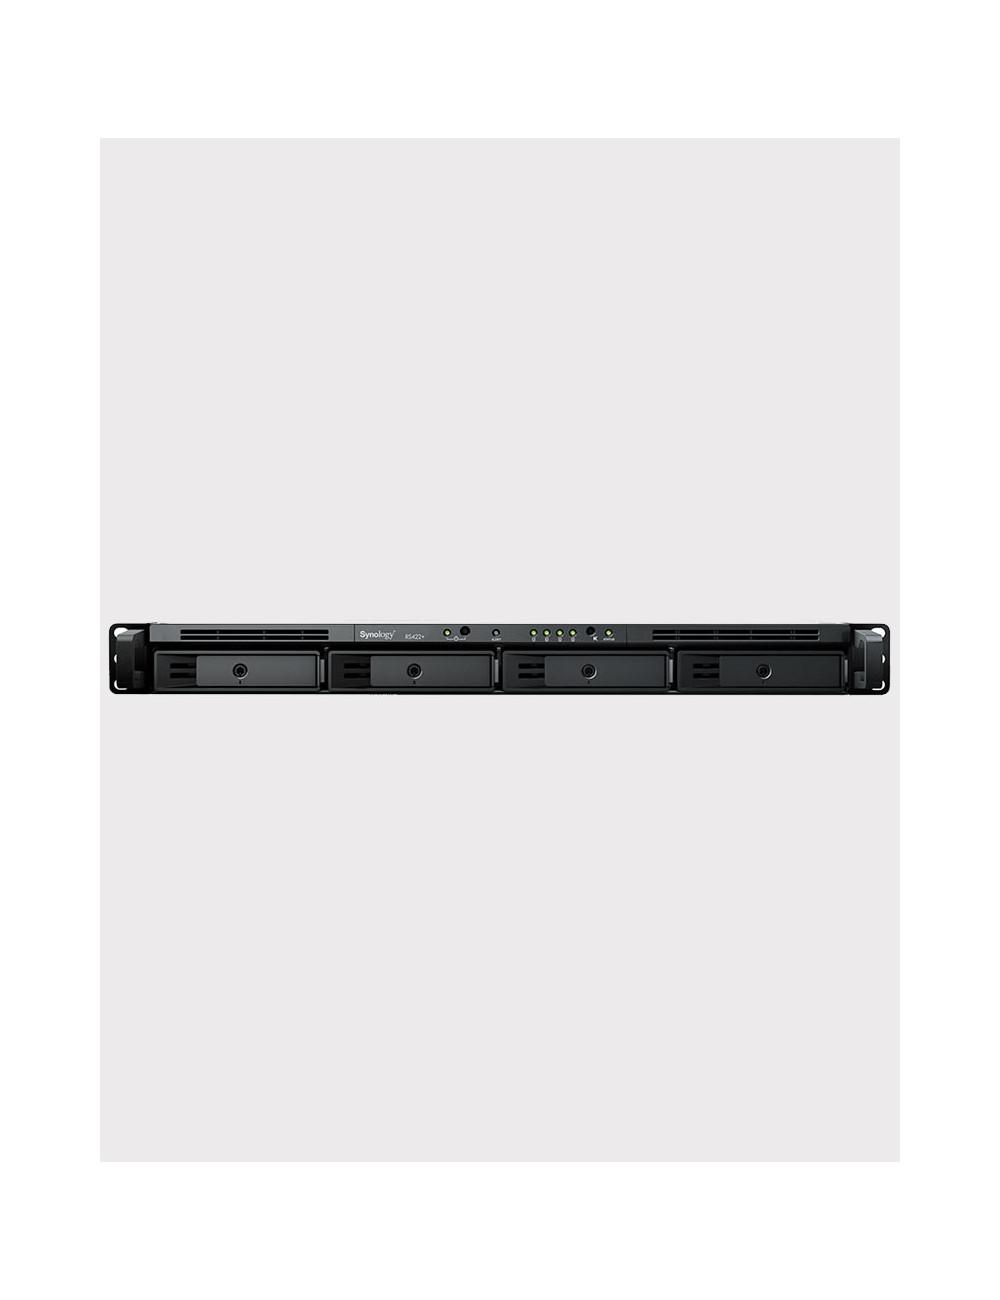 Pack 1 Mailbox Zimbra Basic + Domain .FR - 1 year